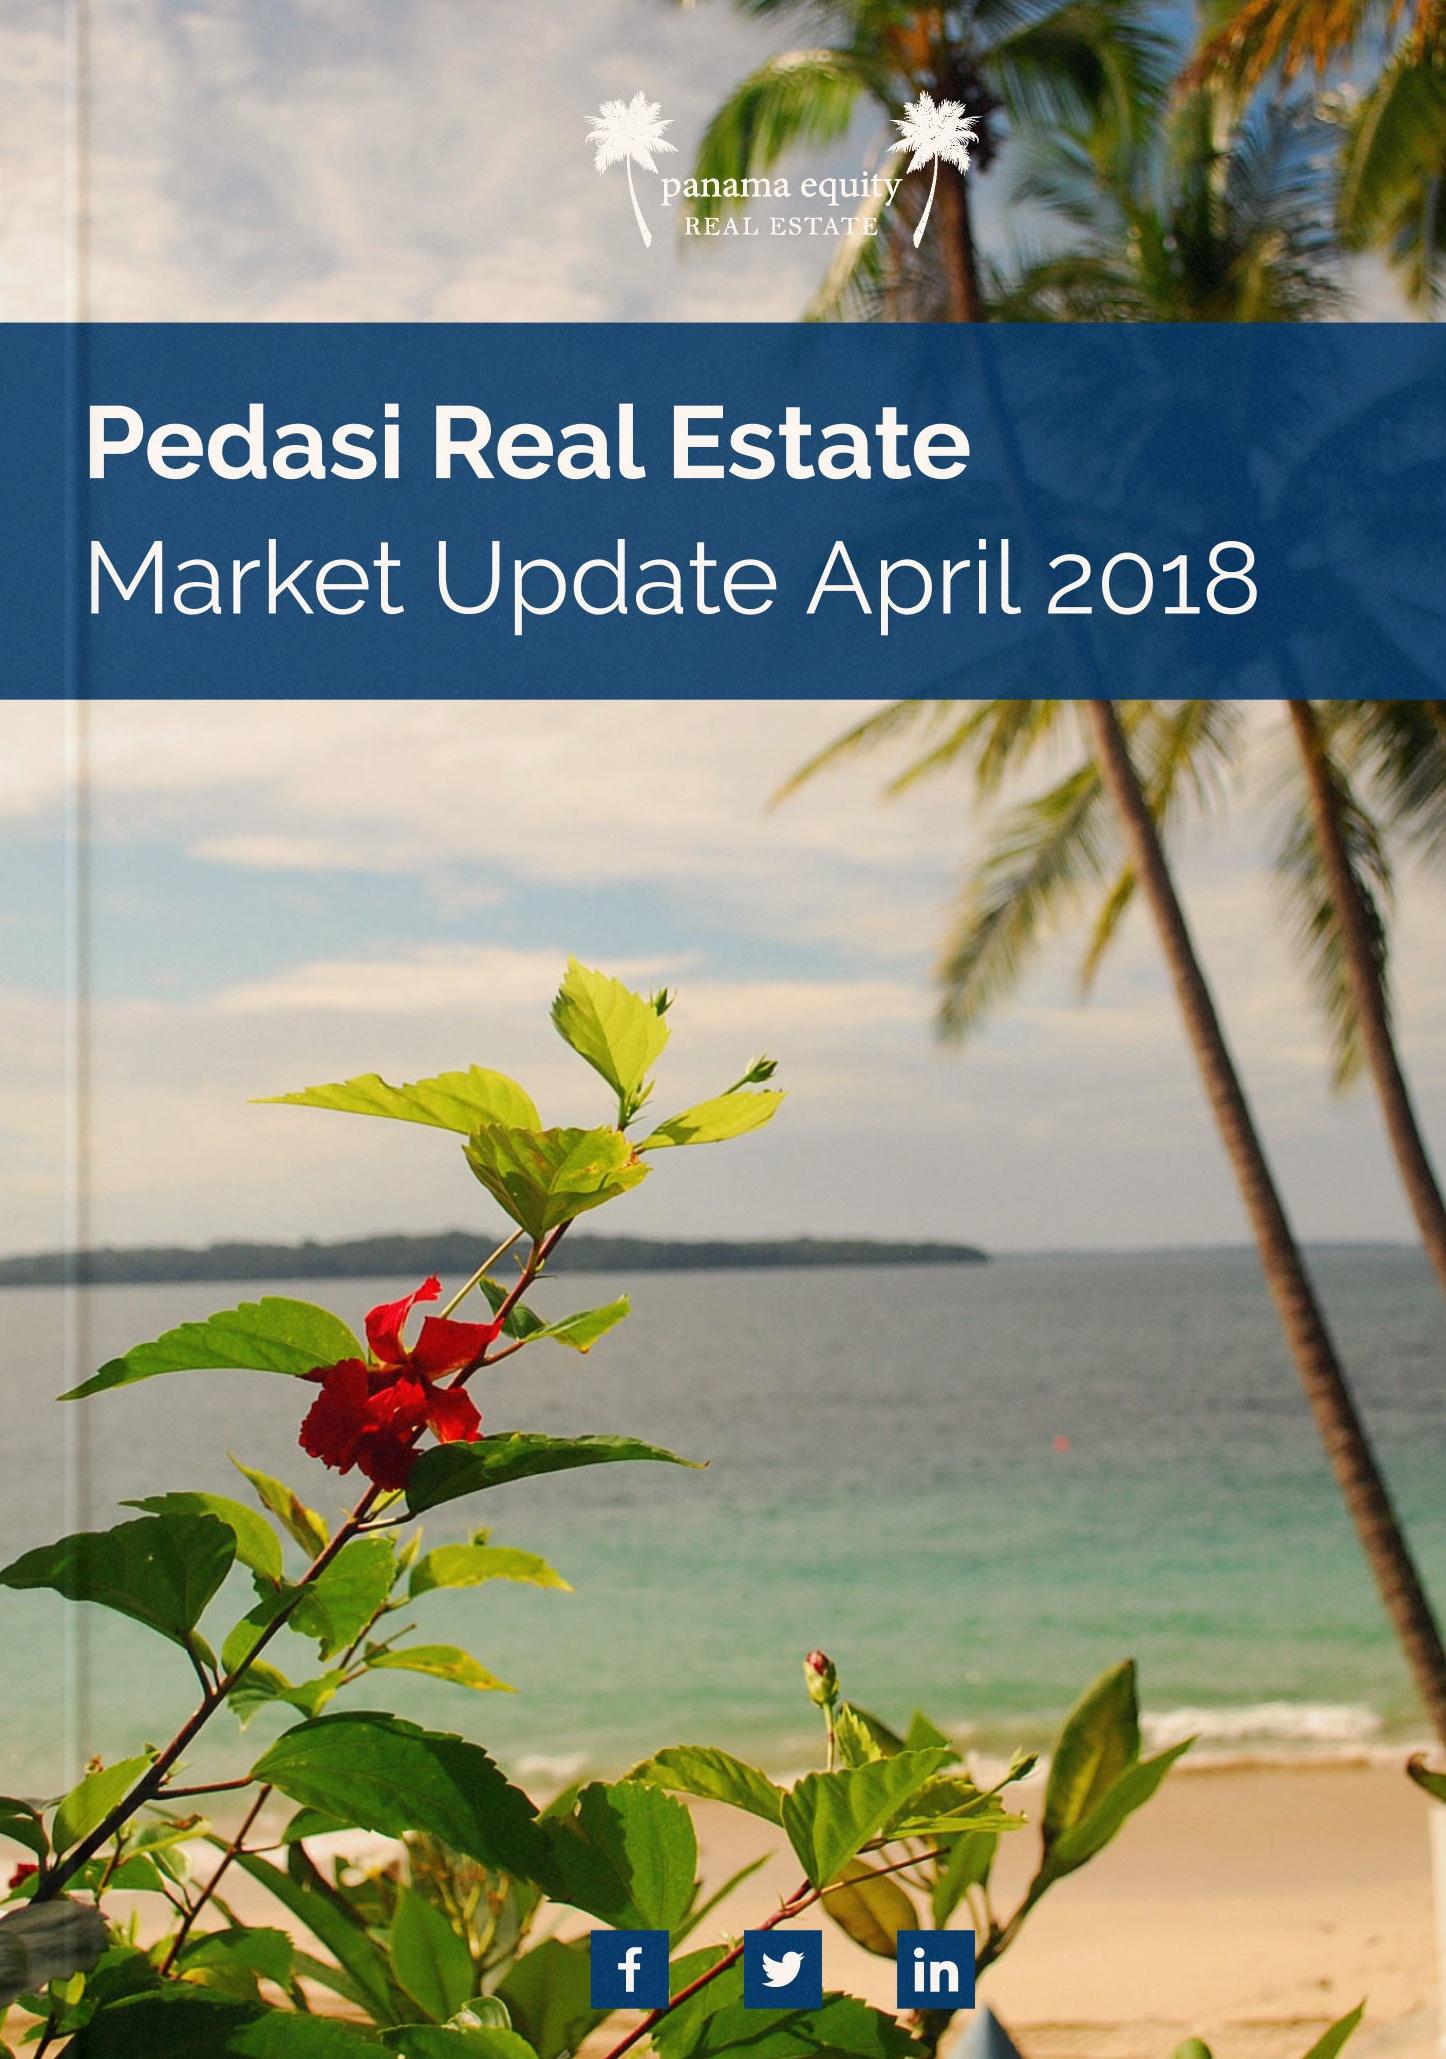 Pedasi Real Estate Market Update